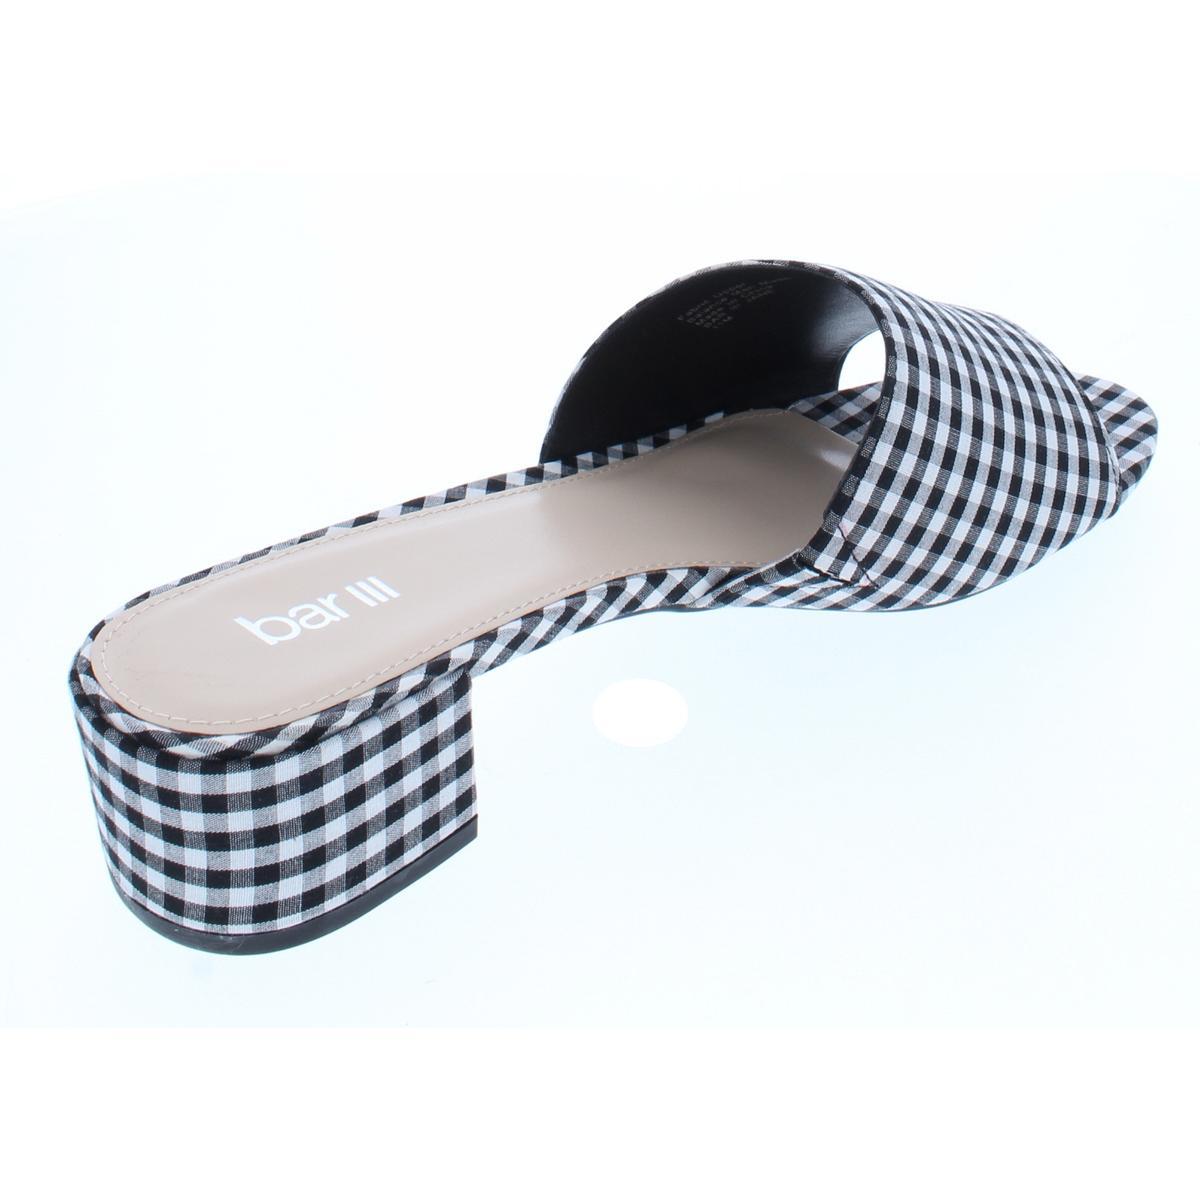 Bar III Womens Jane Padded Insole Open Toe Slide Sandals Shoes BHFO 6711